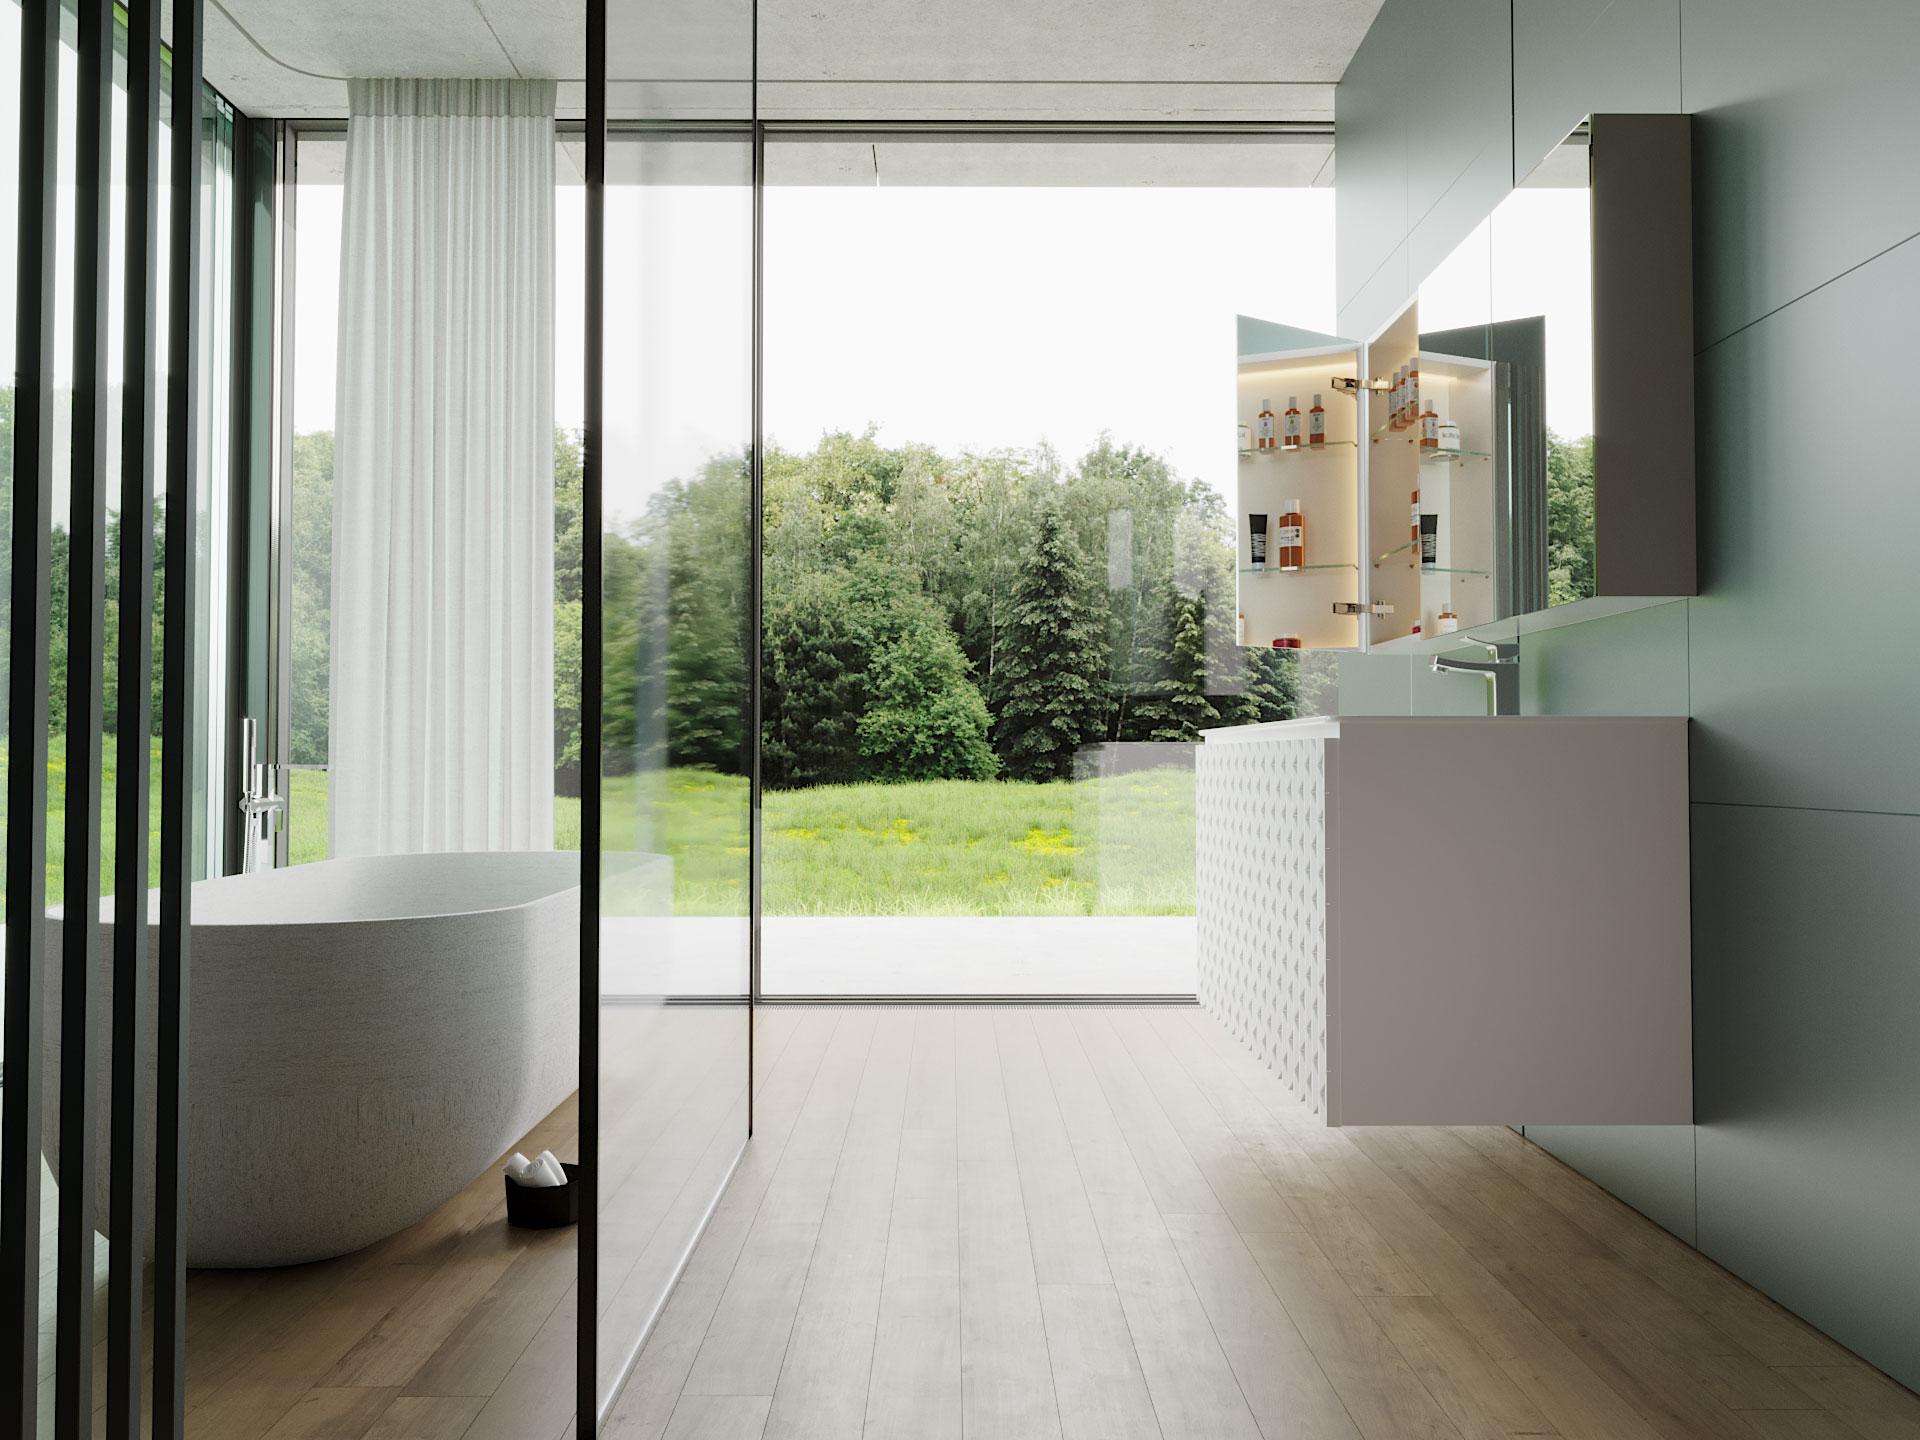 LED Badspiegelschrank beleuchtet nach Maß